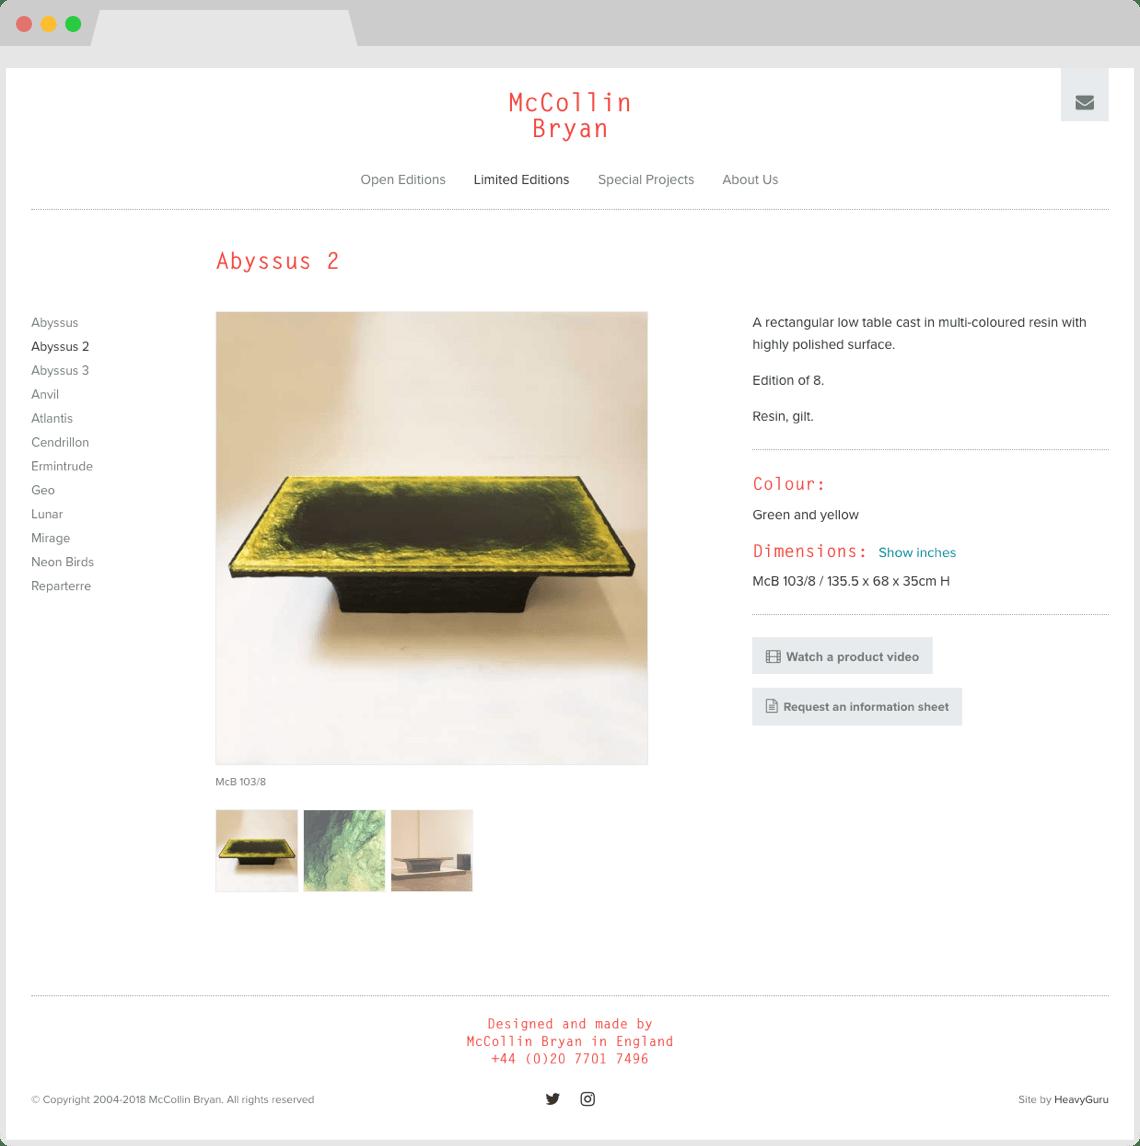 Website design and development, HeavyGuru, London